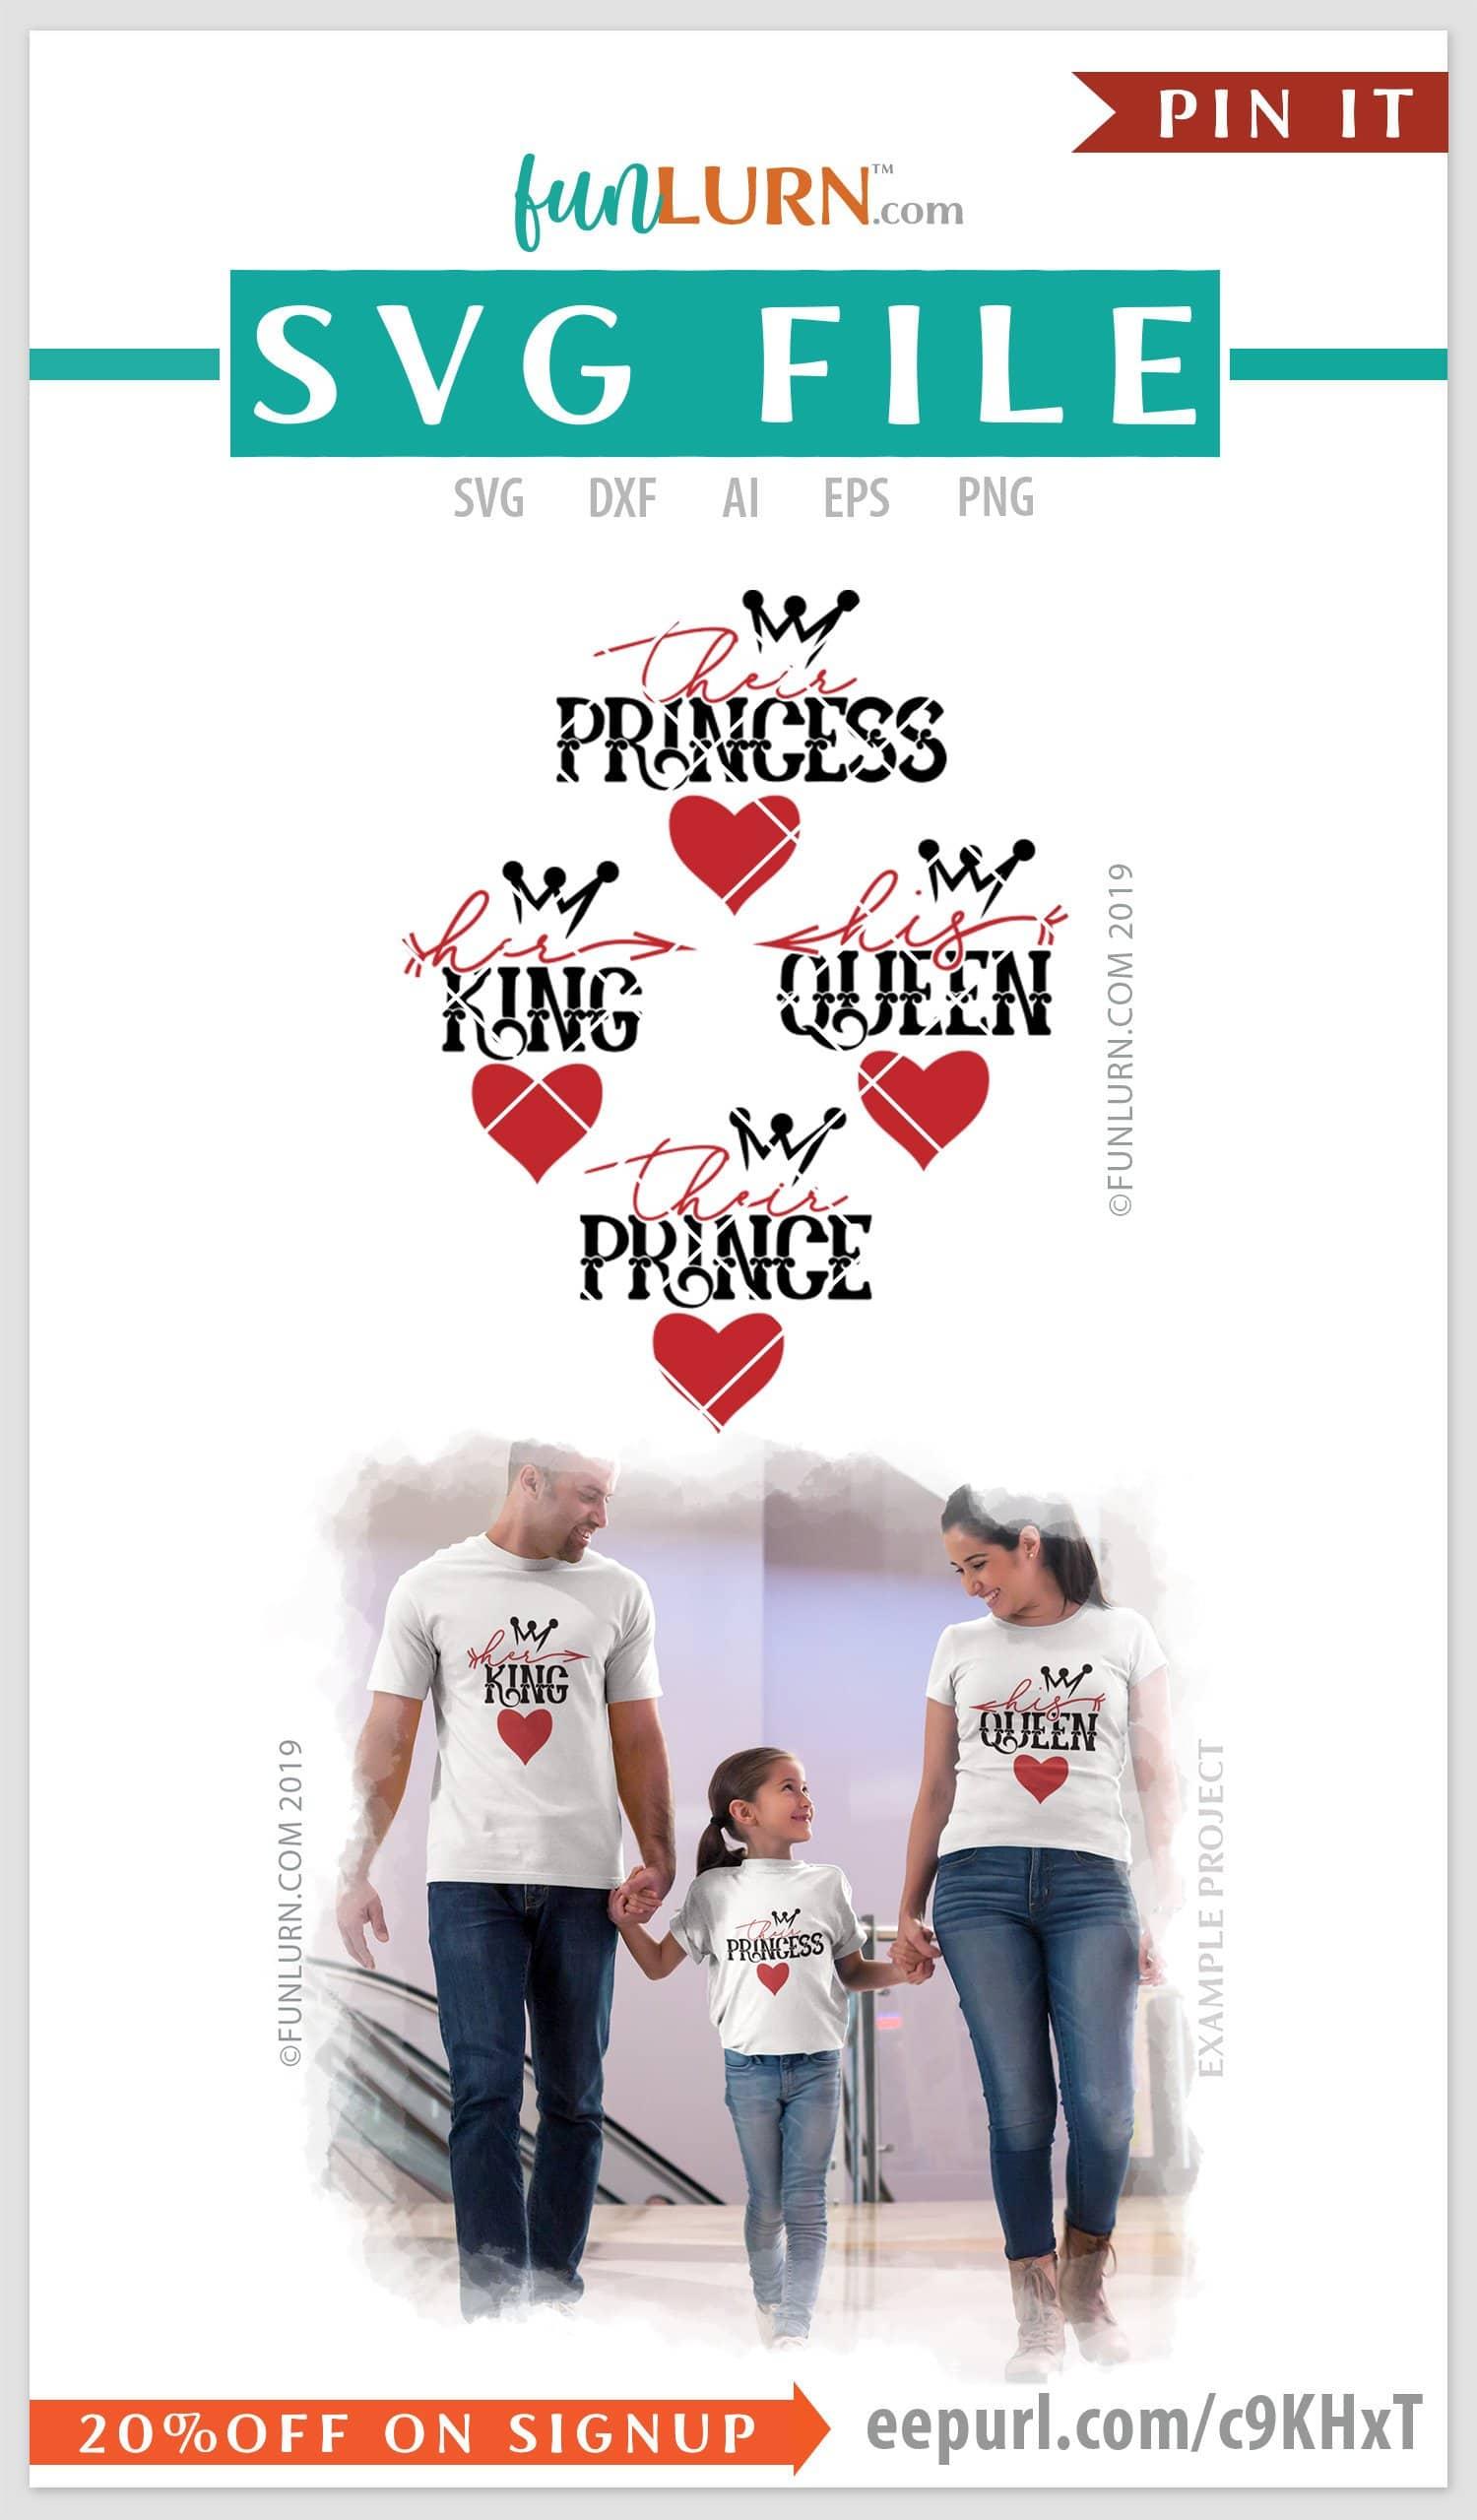 His Queen Her King Svg.Her King Svg His Queen Svg Their Prince Svg Their Princess Svg